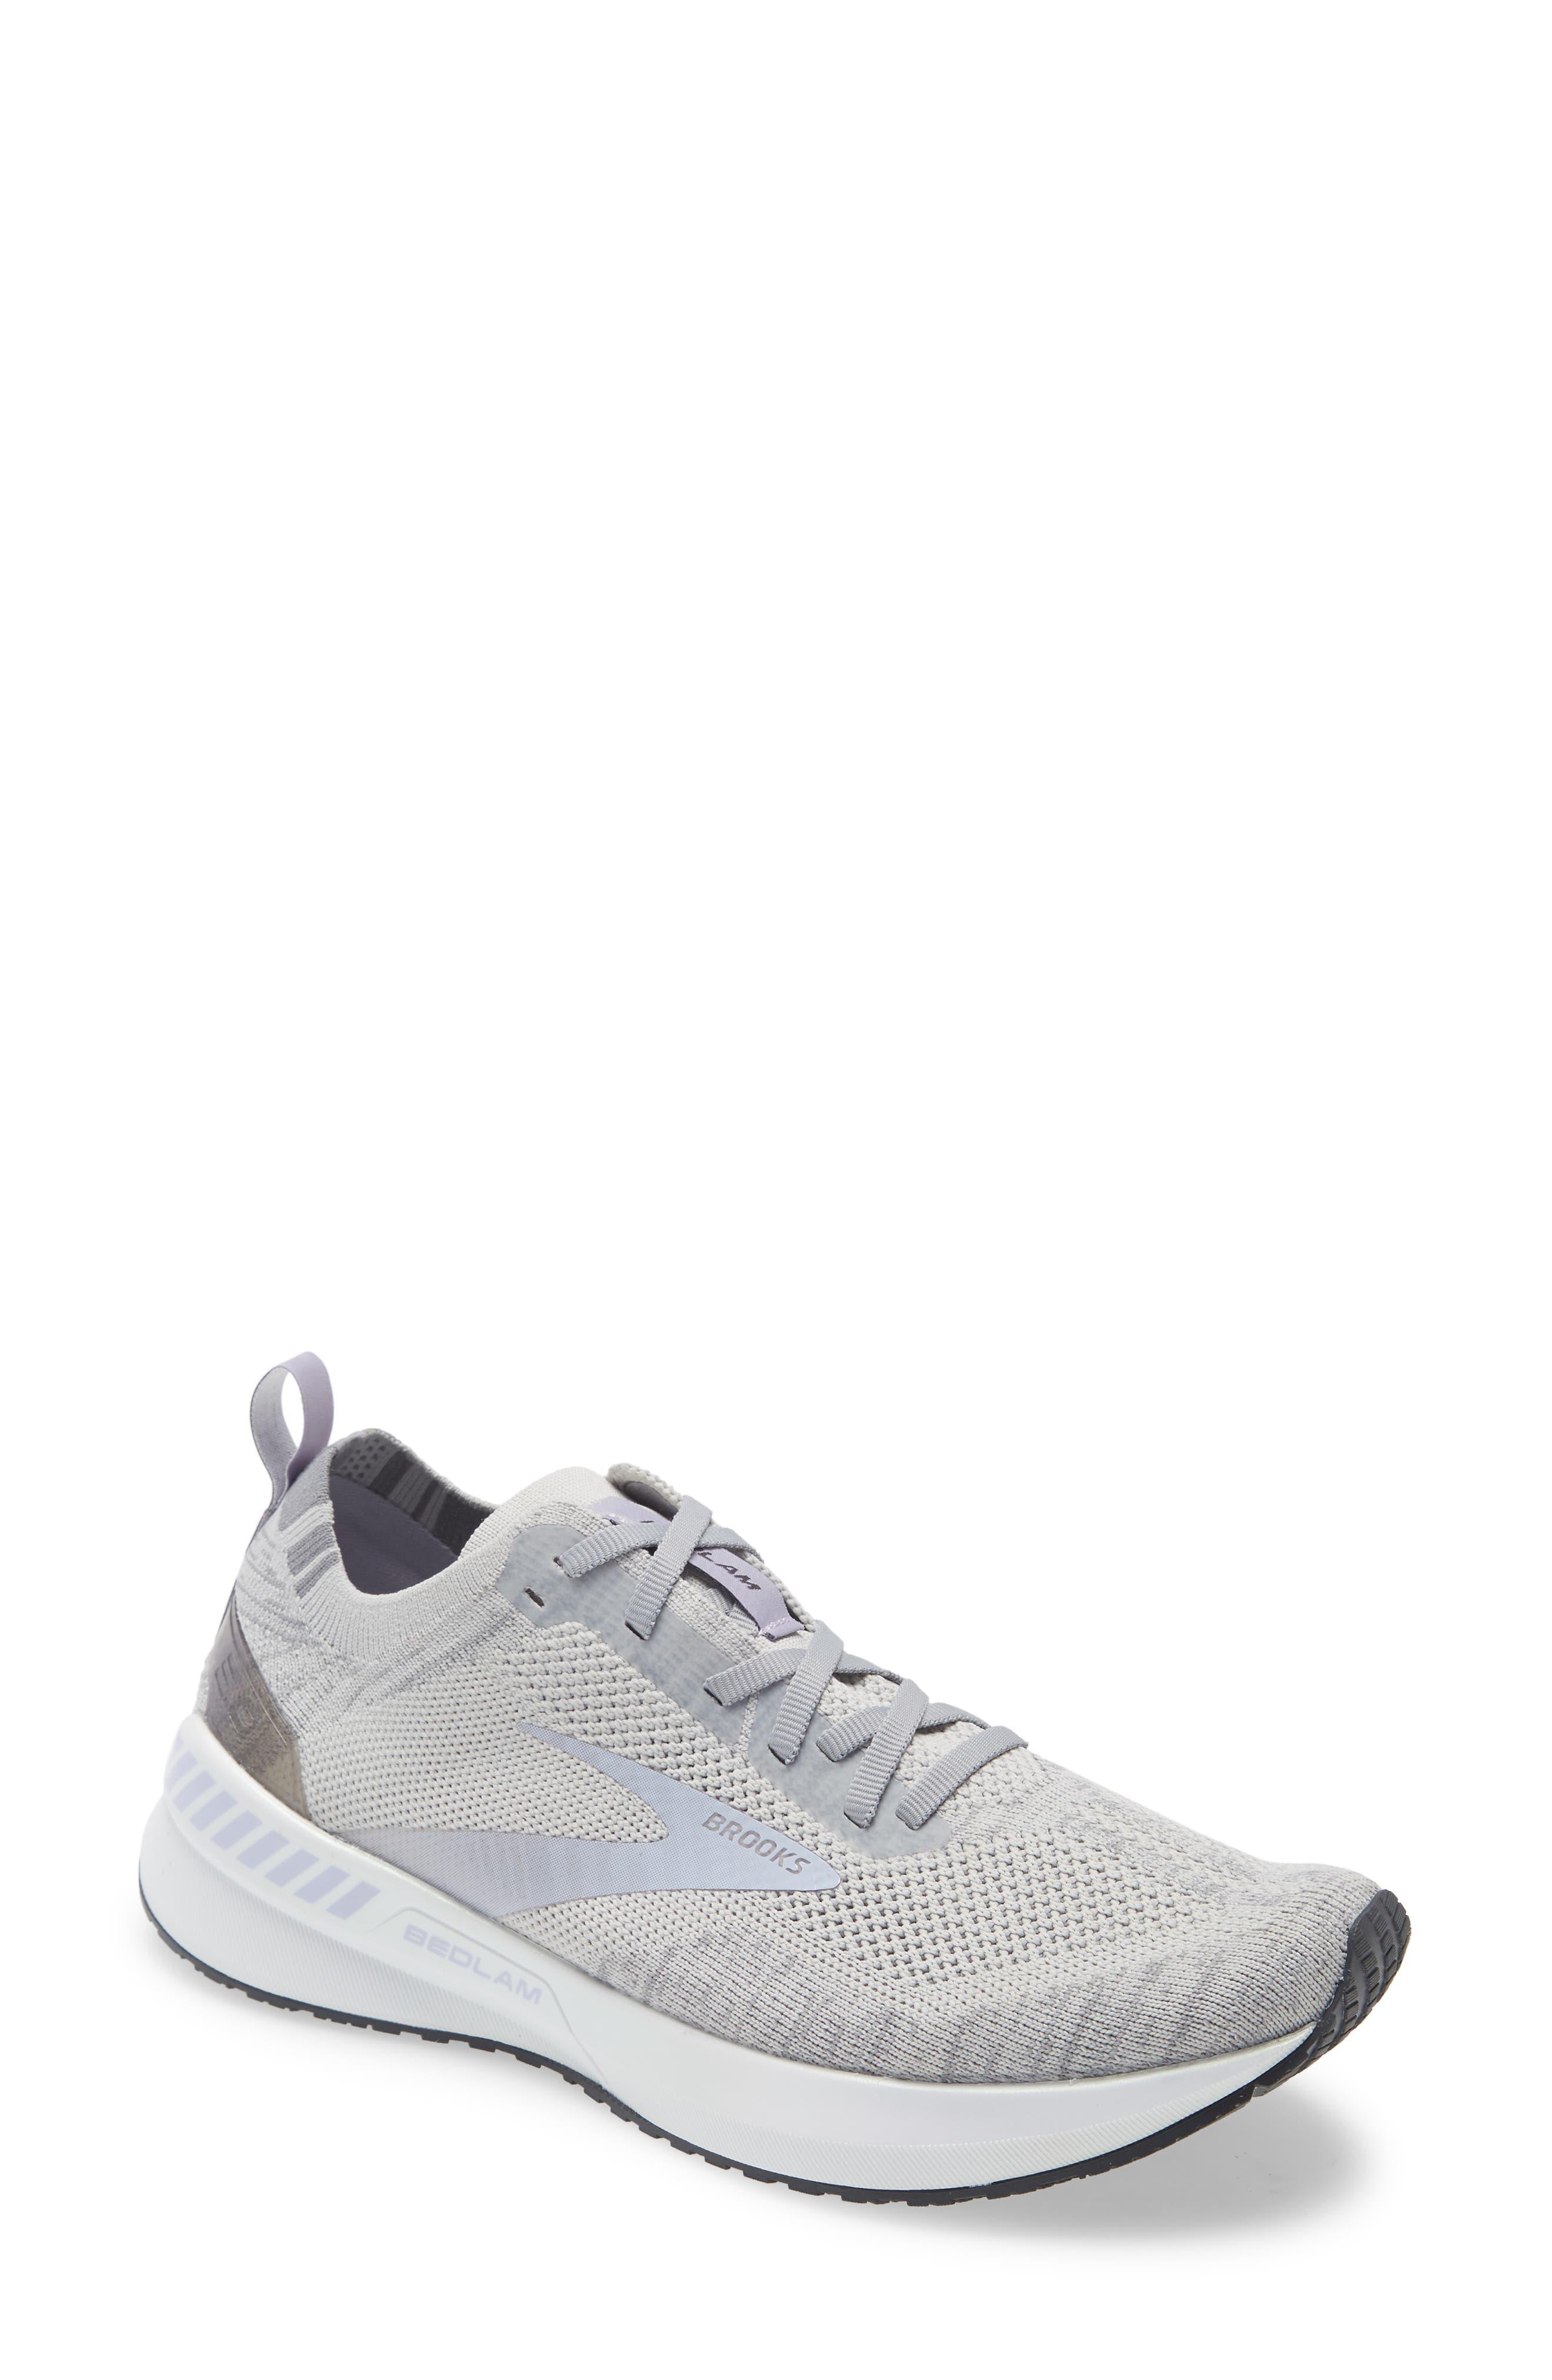 Bedlam 3 Running Shoe